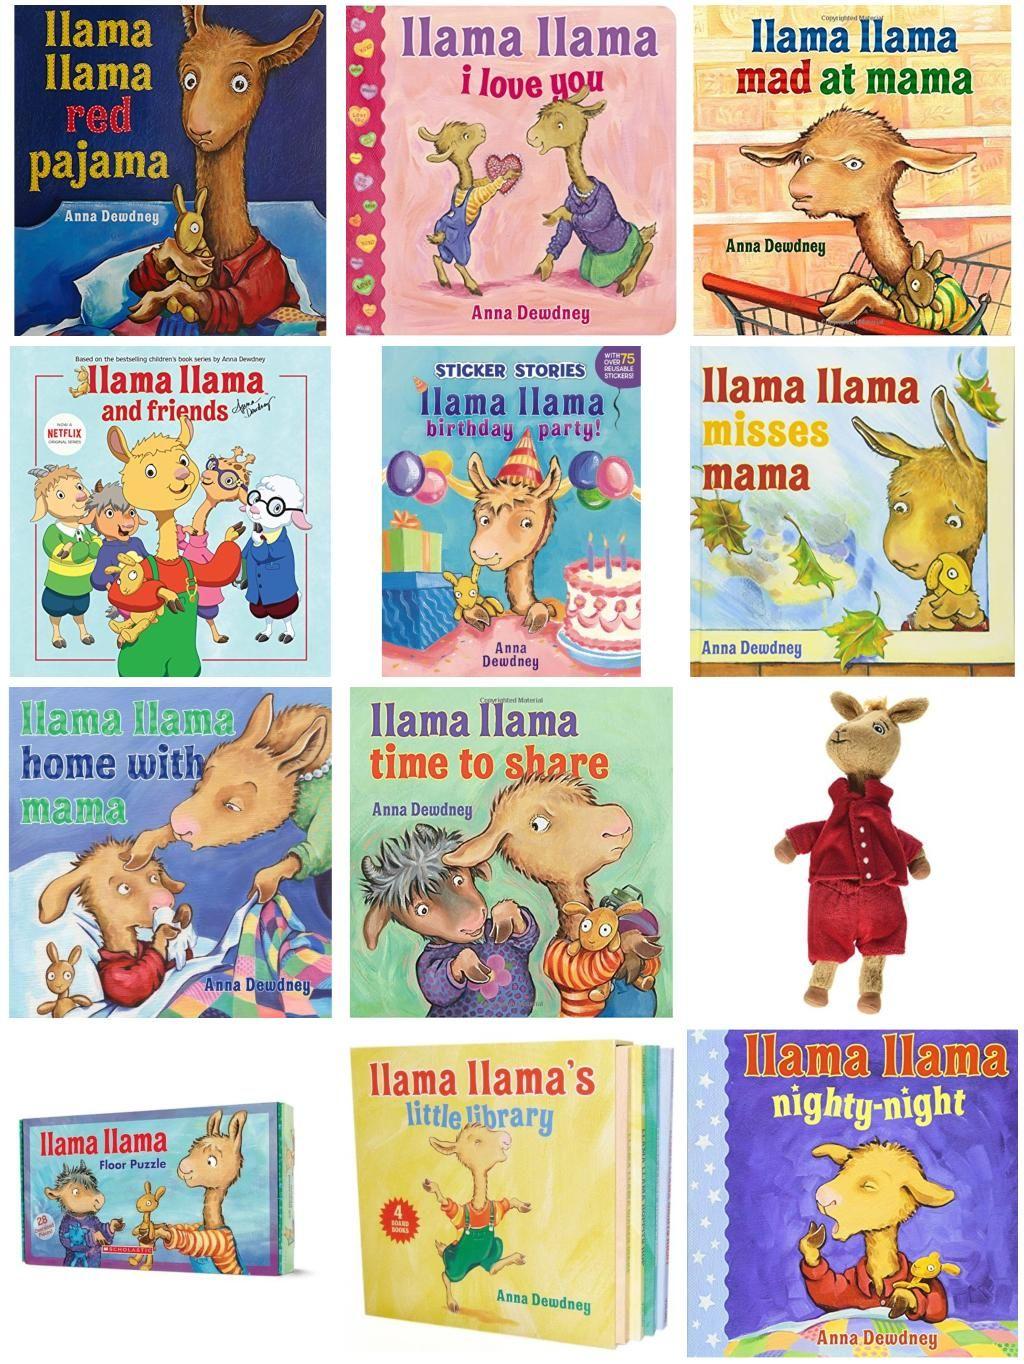 12 Books And Ts For Llama Llama Lovers